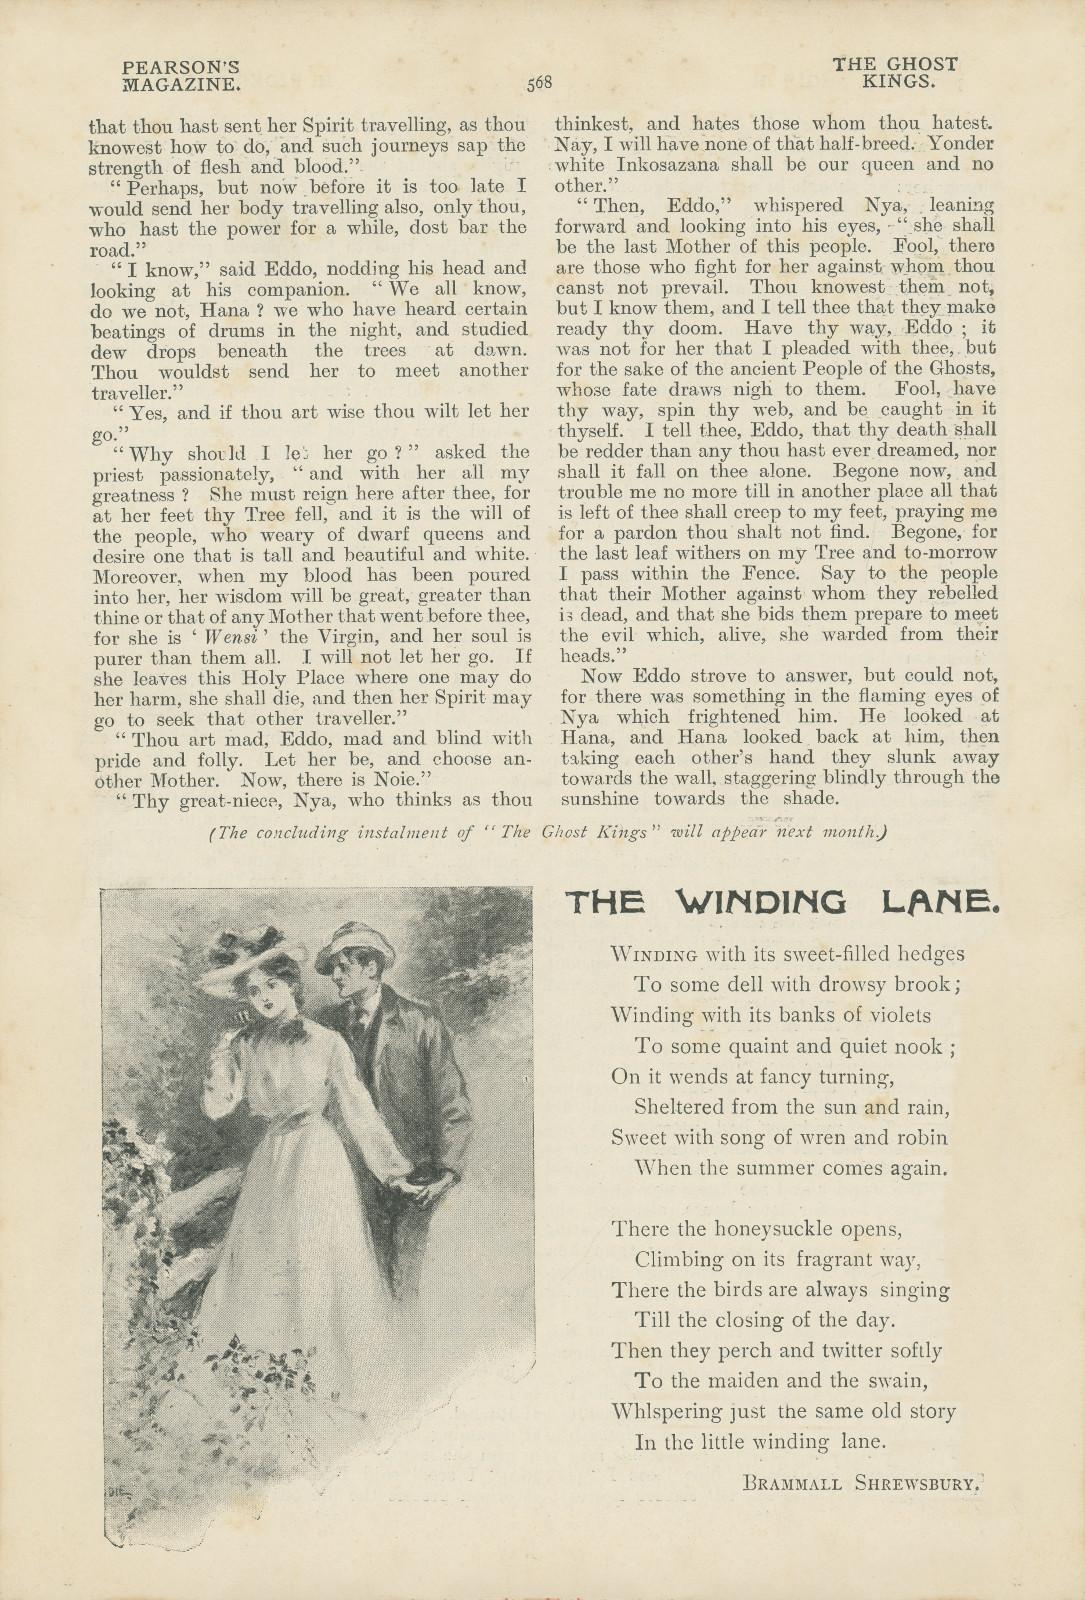 Theconcludingpearsonsmagazine568